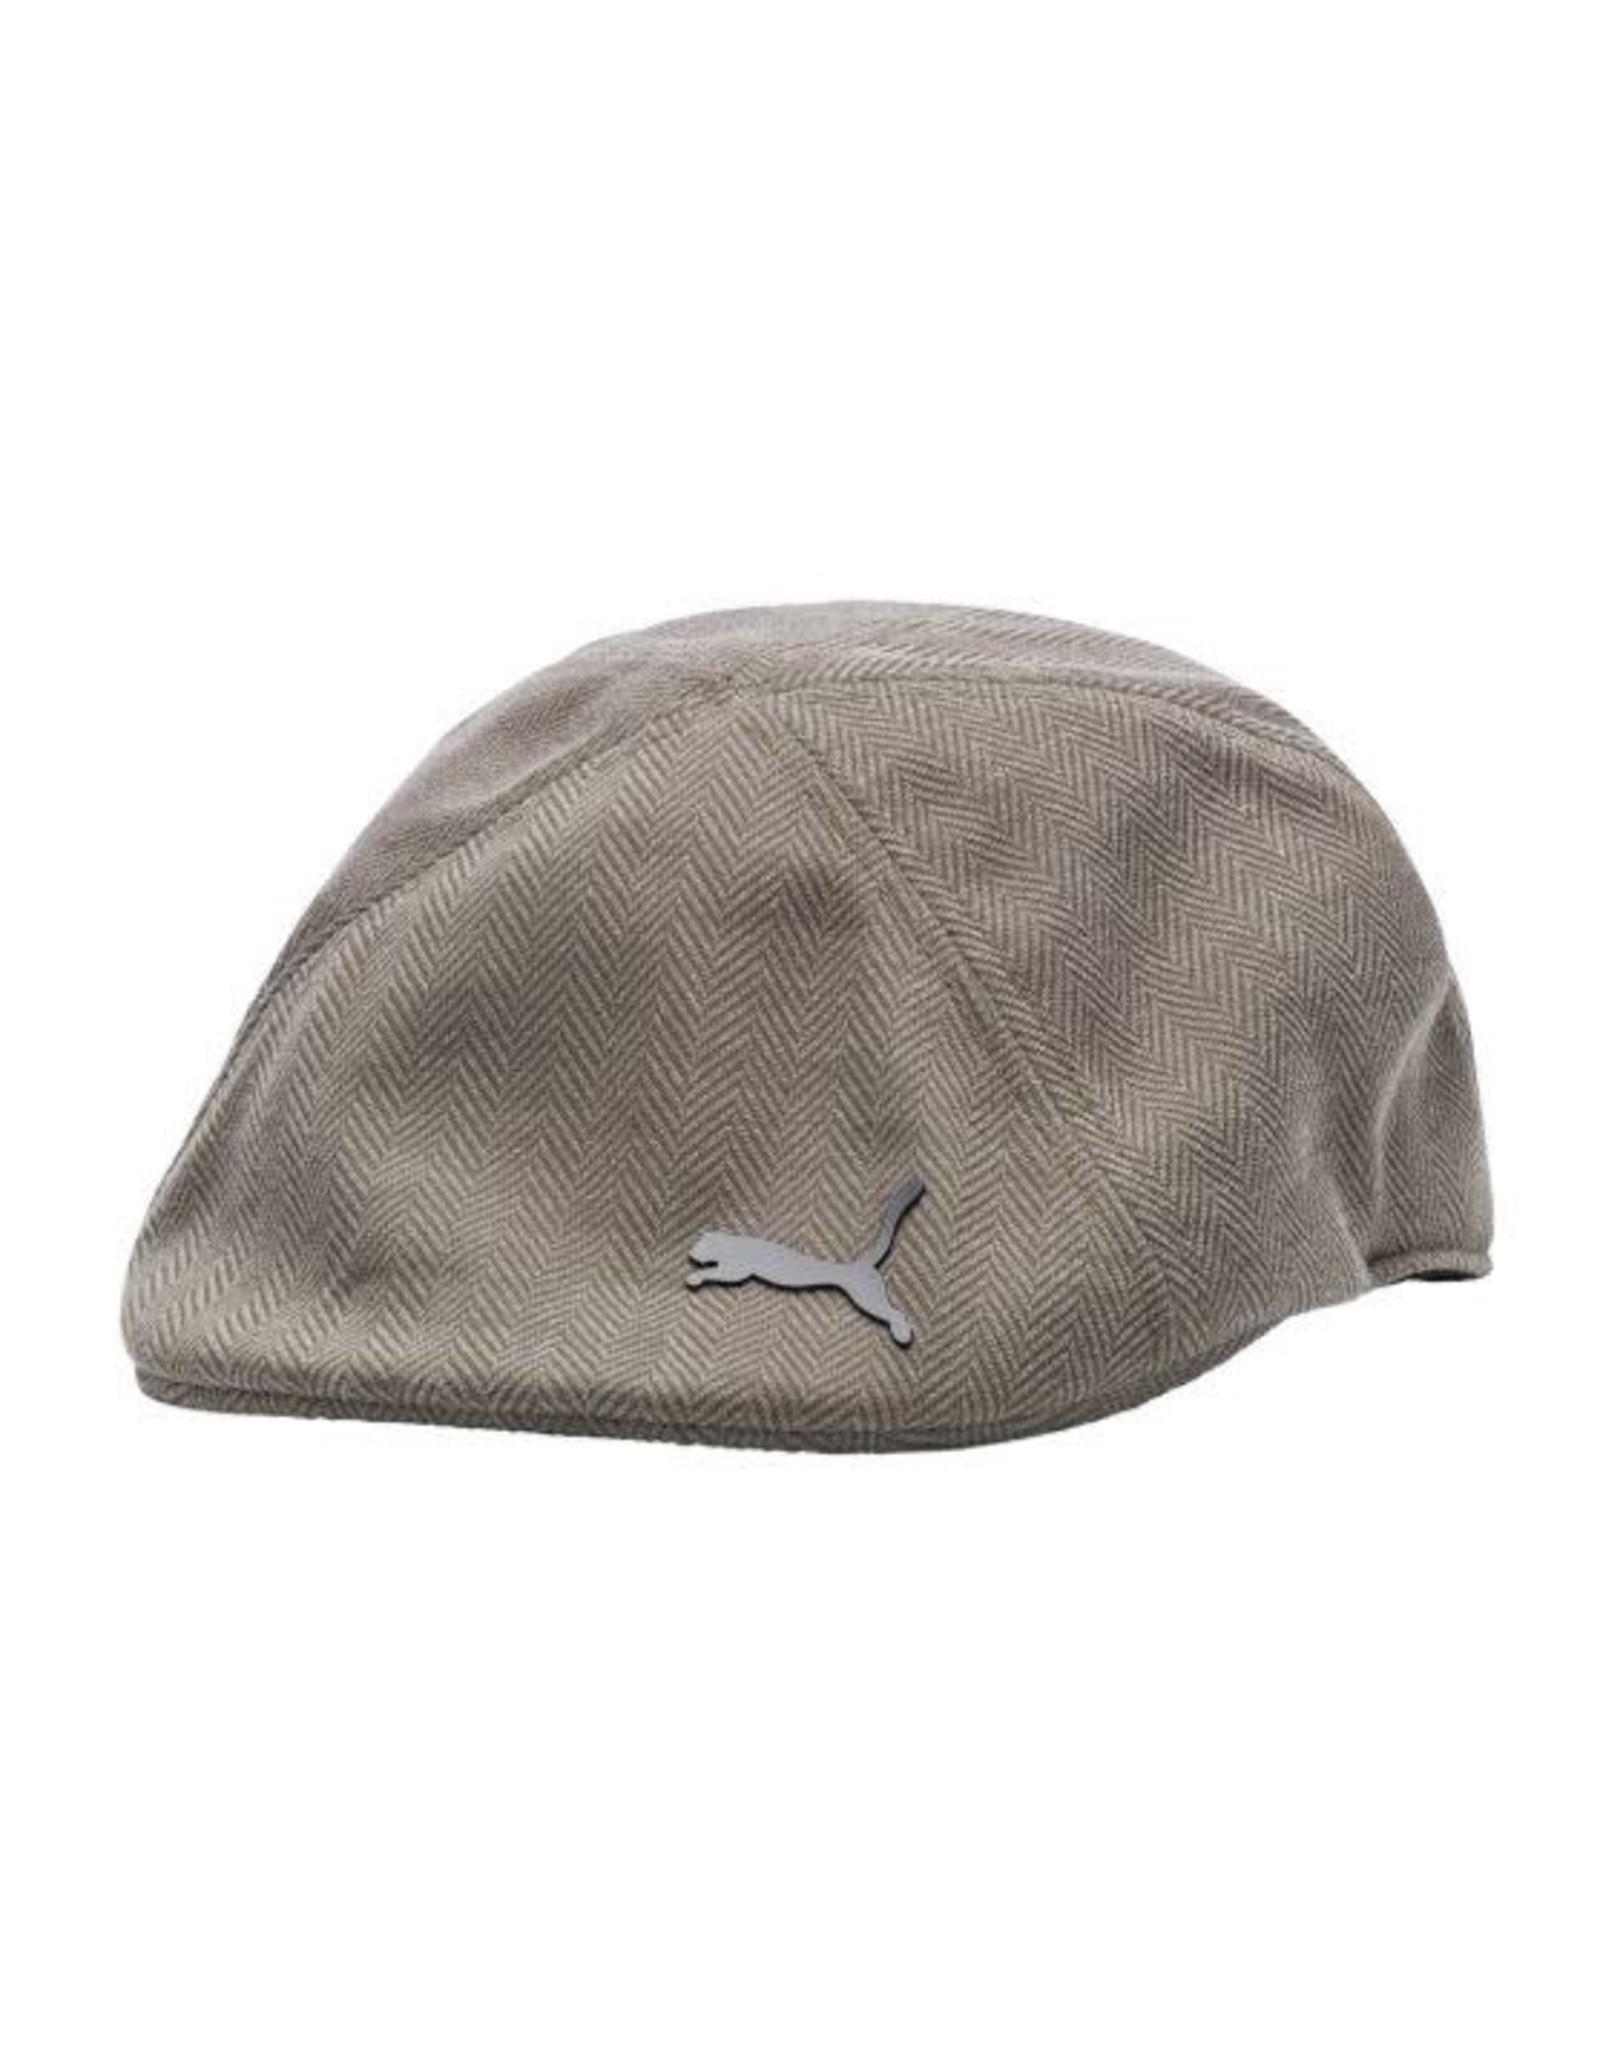 Puma Driver Hat